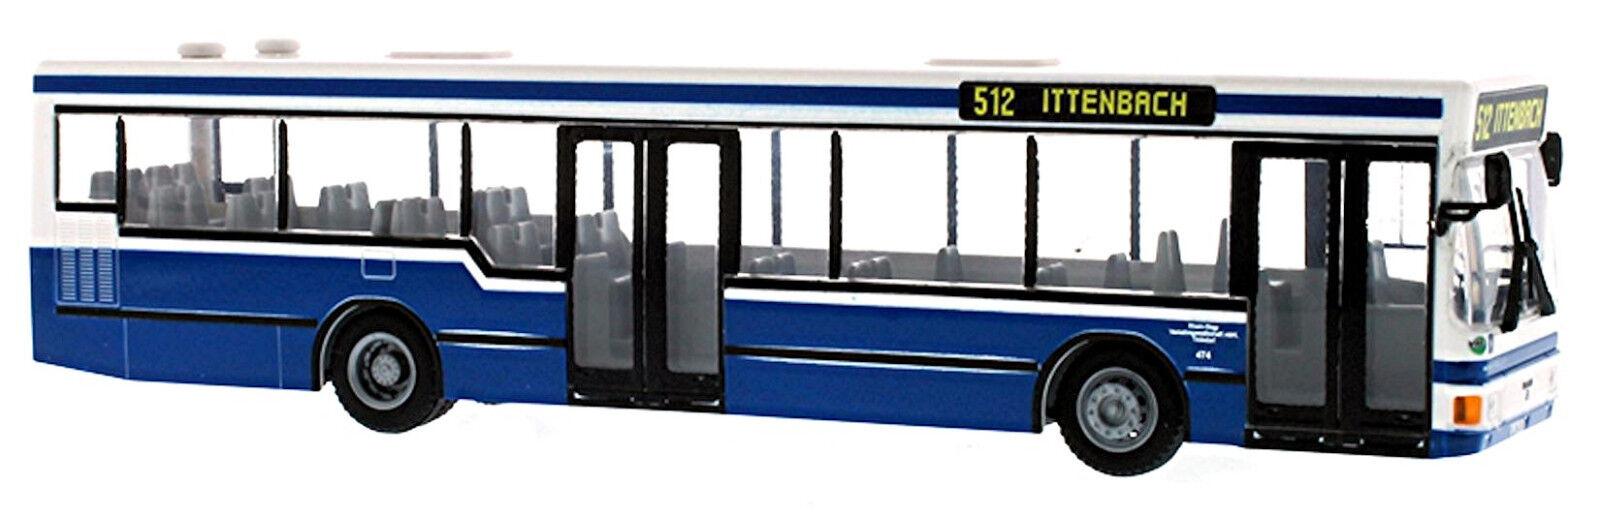 Man NL 202-2 RSVG Troisdorf City Bus 1 87 Rietze 75000